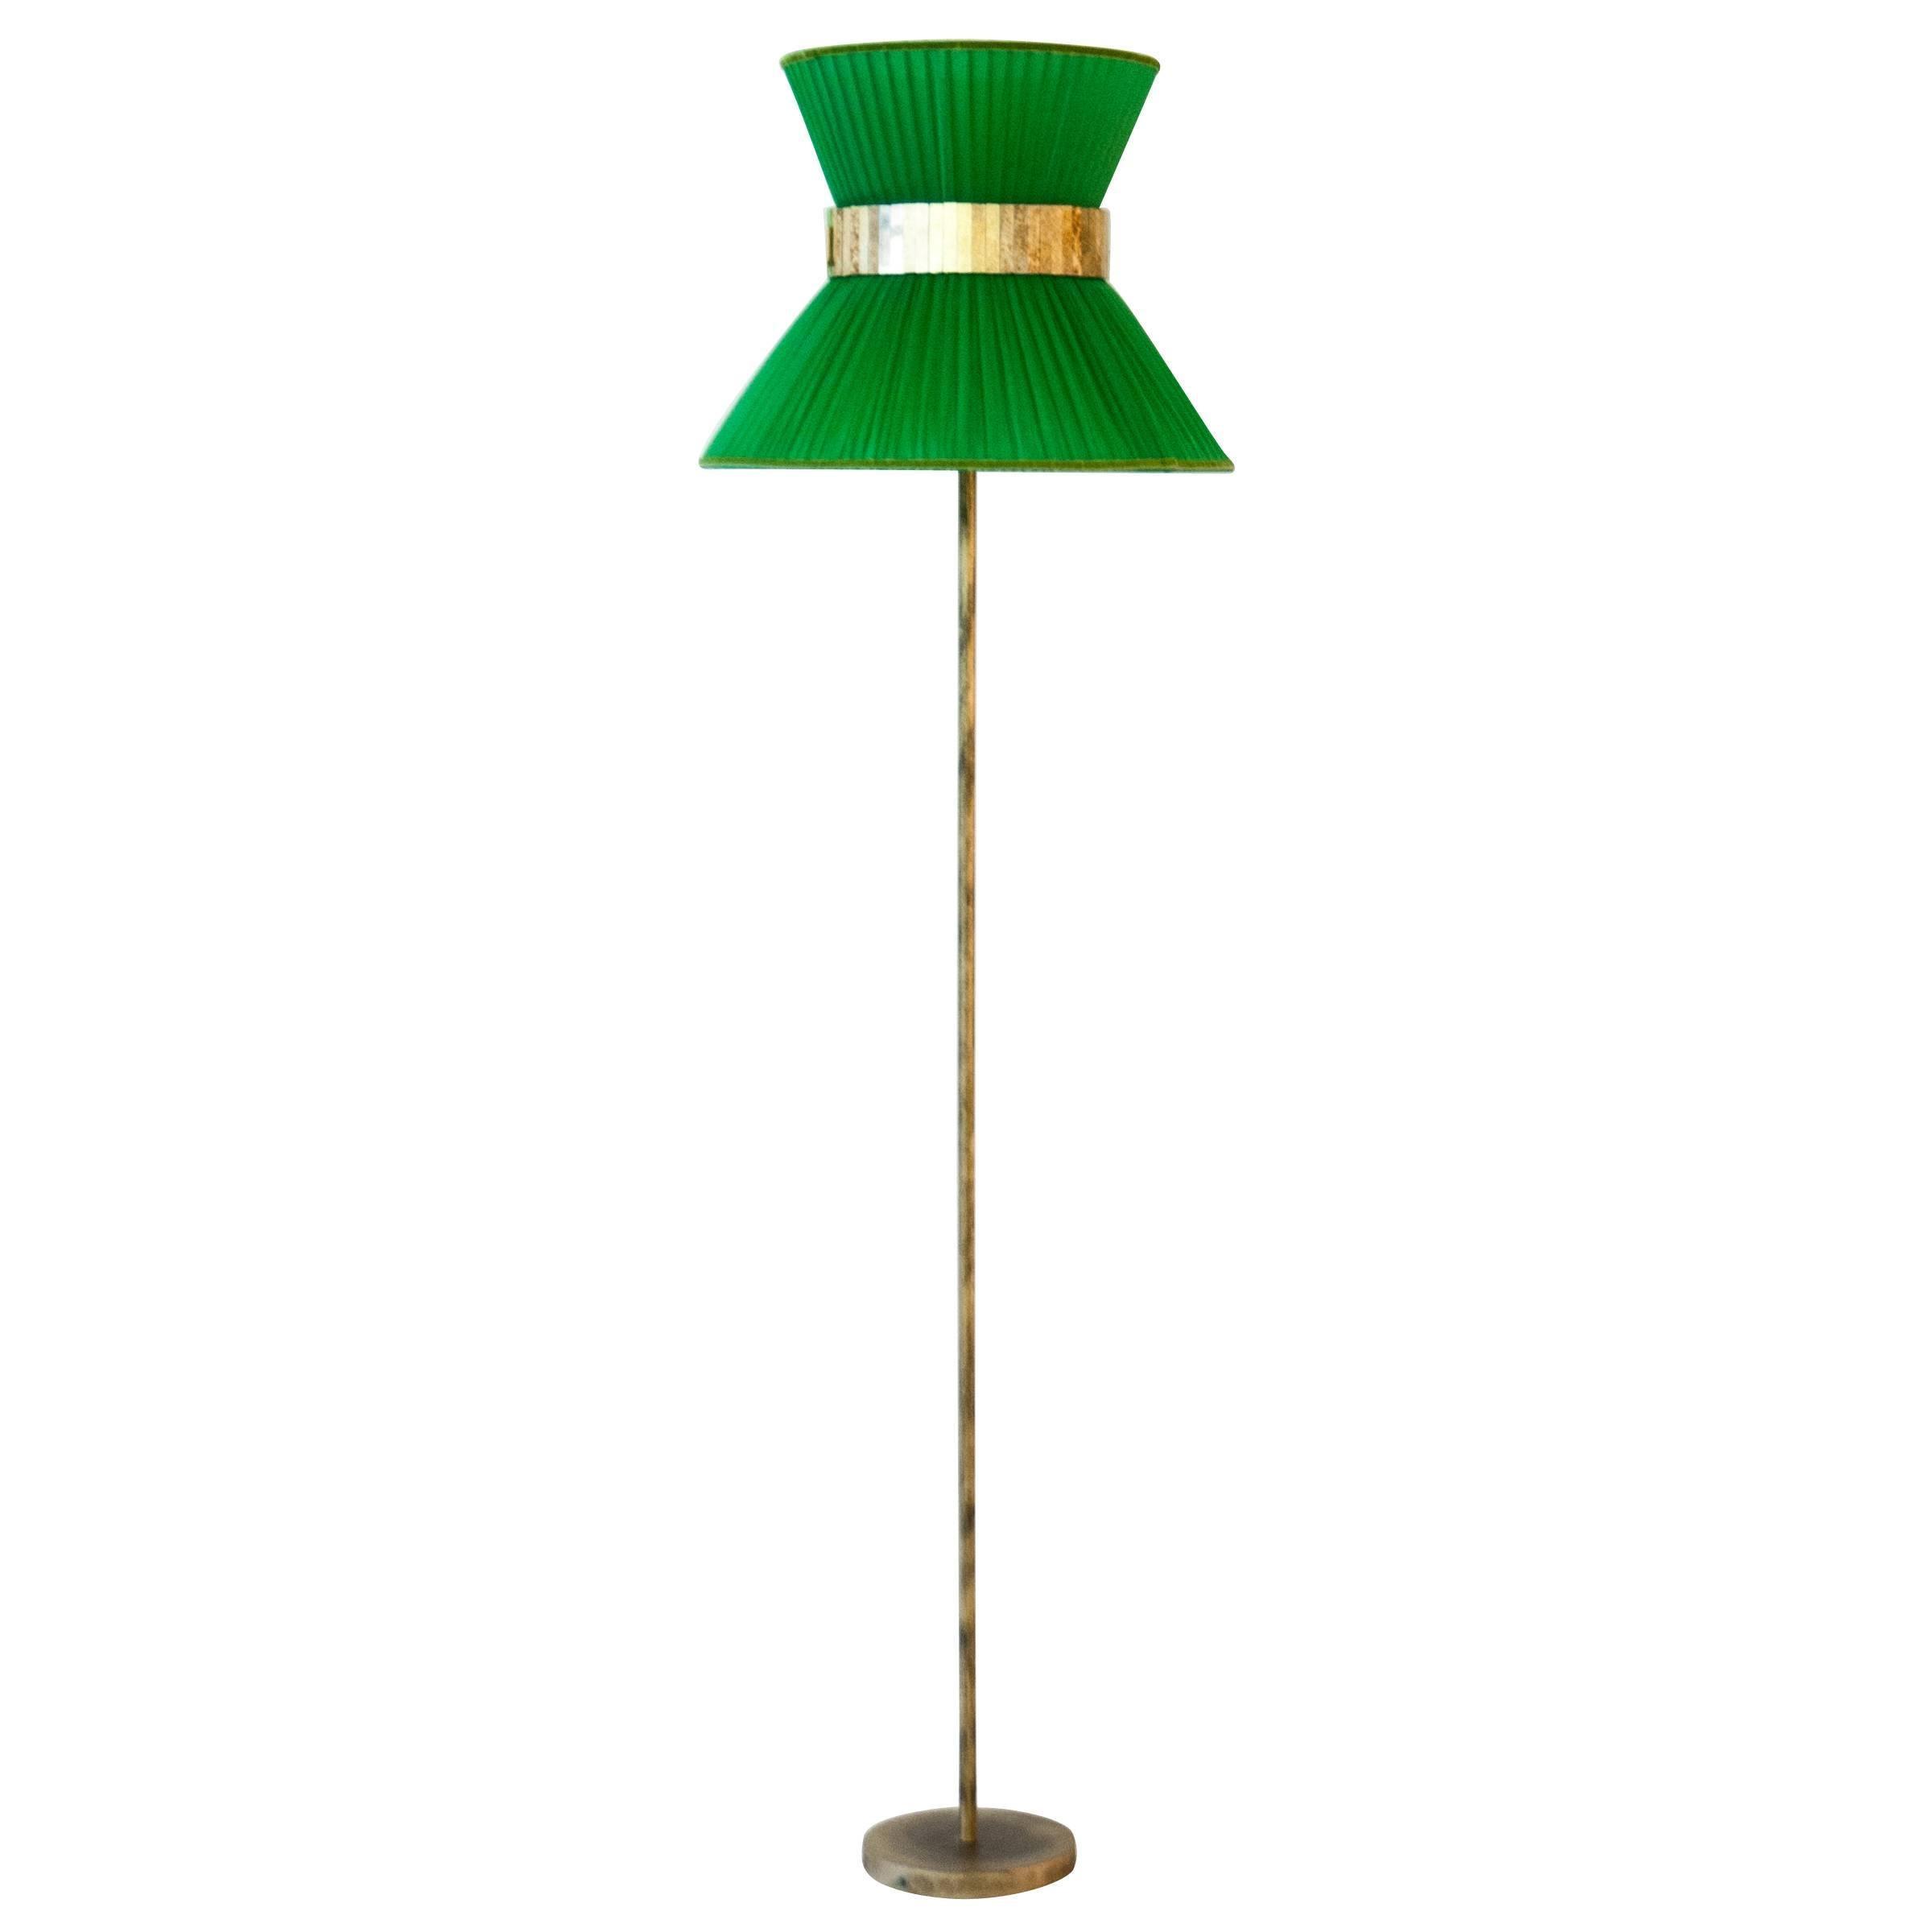 Tiffany contemporary Floor Lamp 40 emerald Silk Brass Silvered Glass